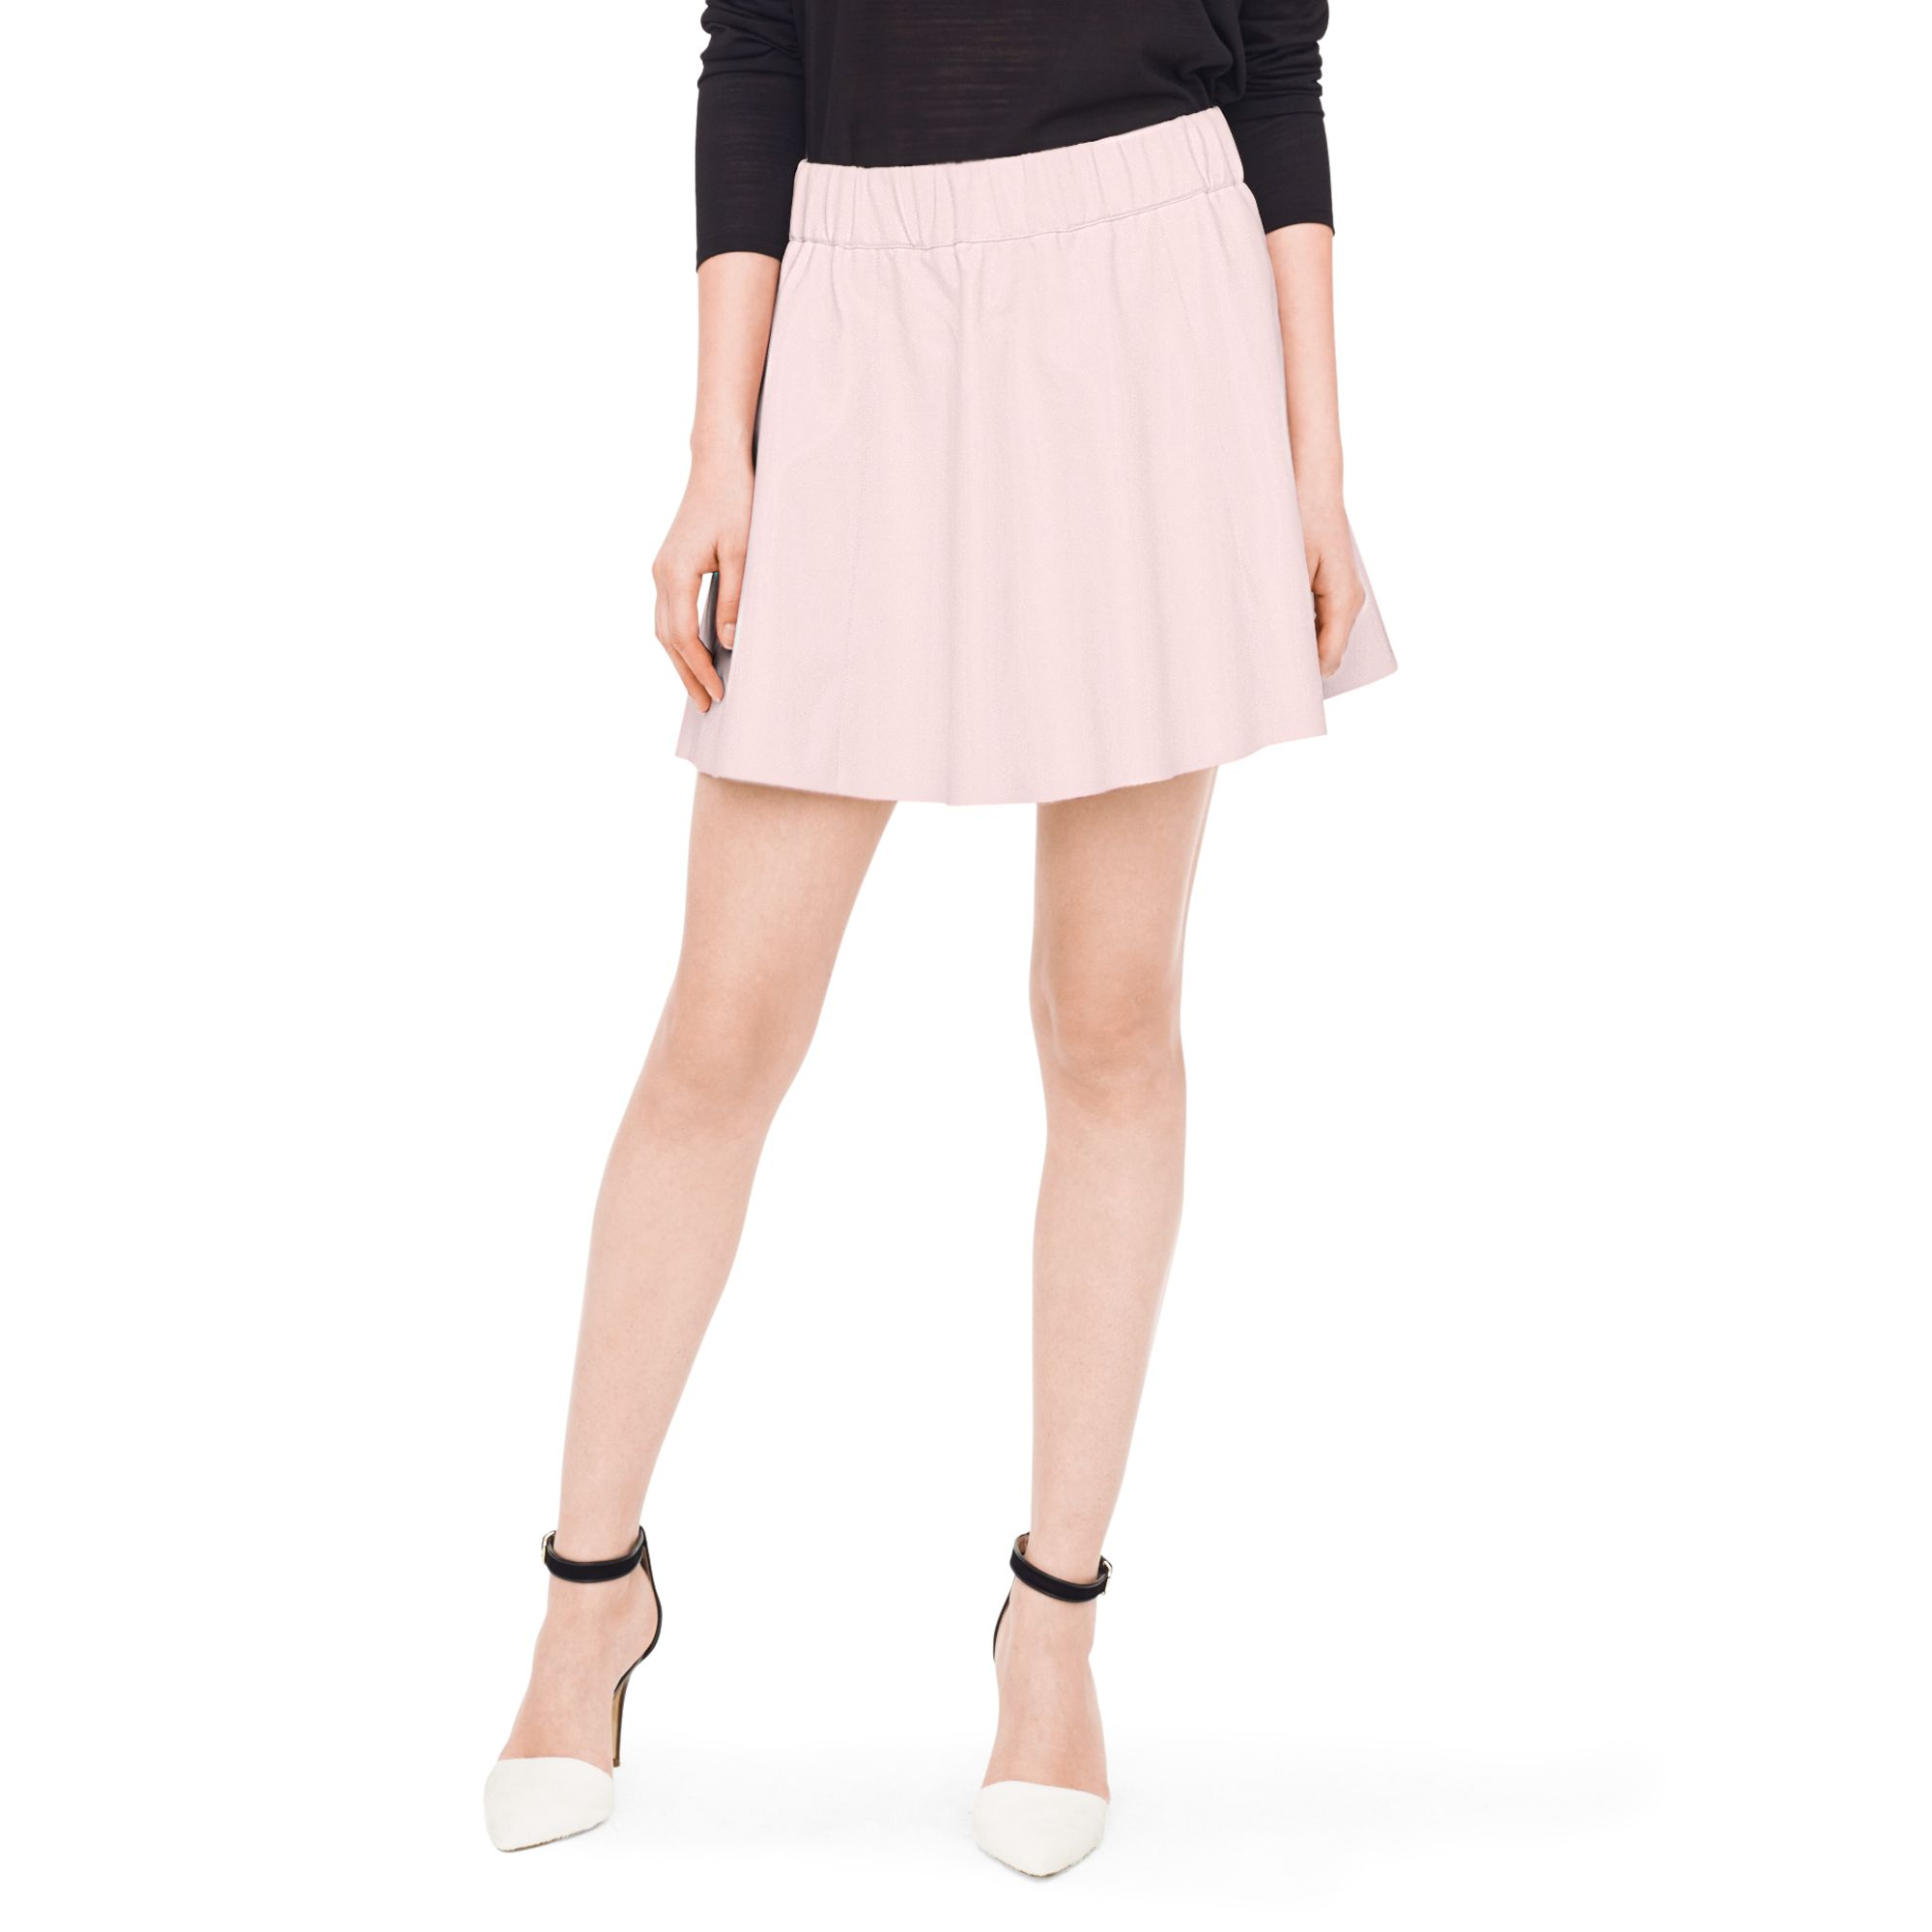 68ce52f893 Lyst - Club Monaco Lyn Faux-leather Skirt in Black